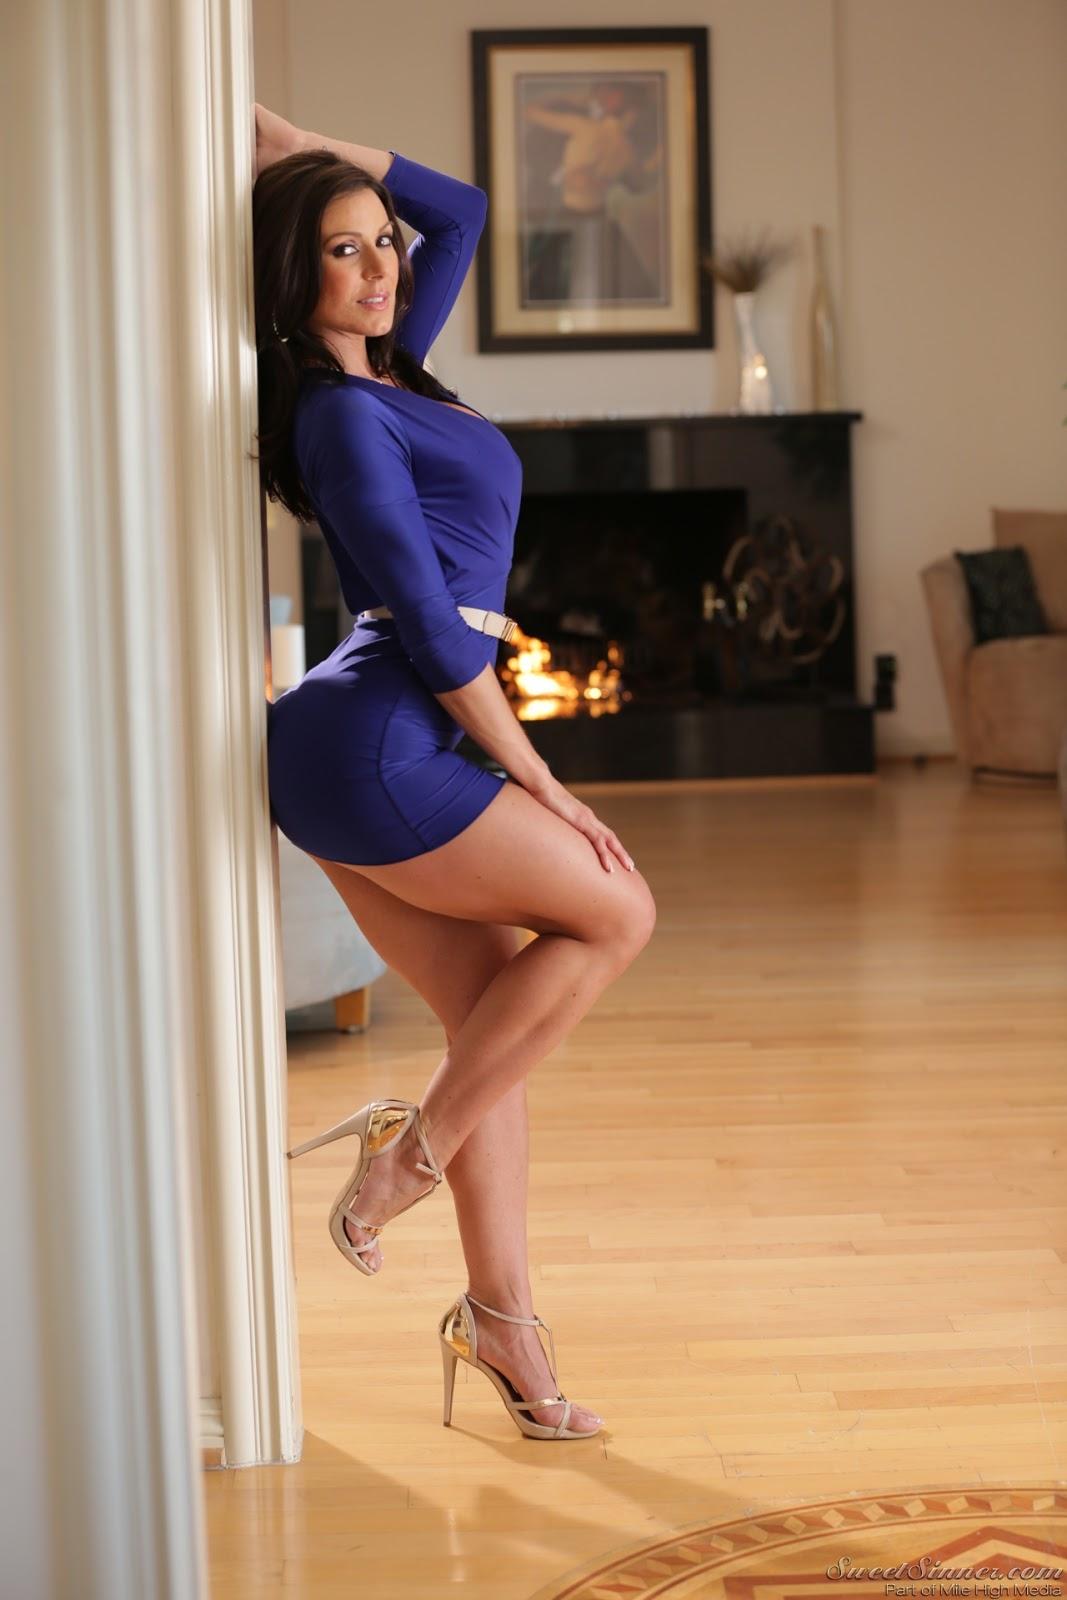 Wrap-Up Magazine: Kendra Lust Top 5 Hottest Photos